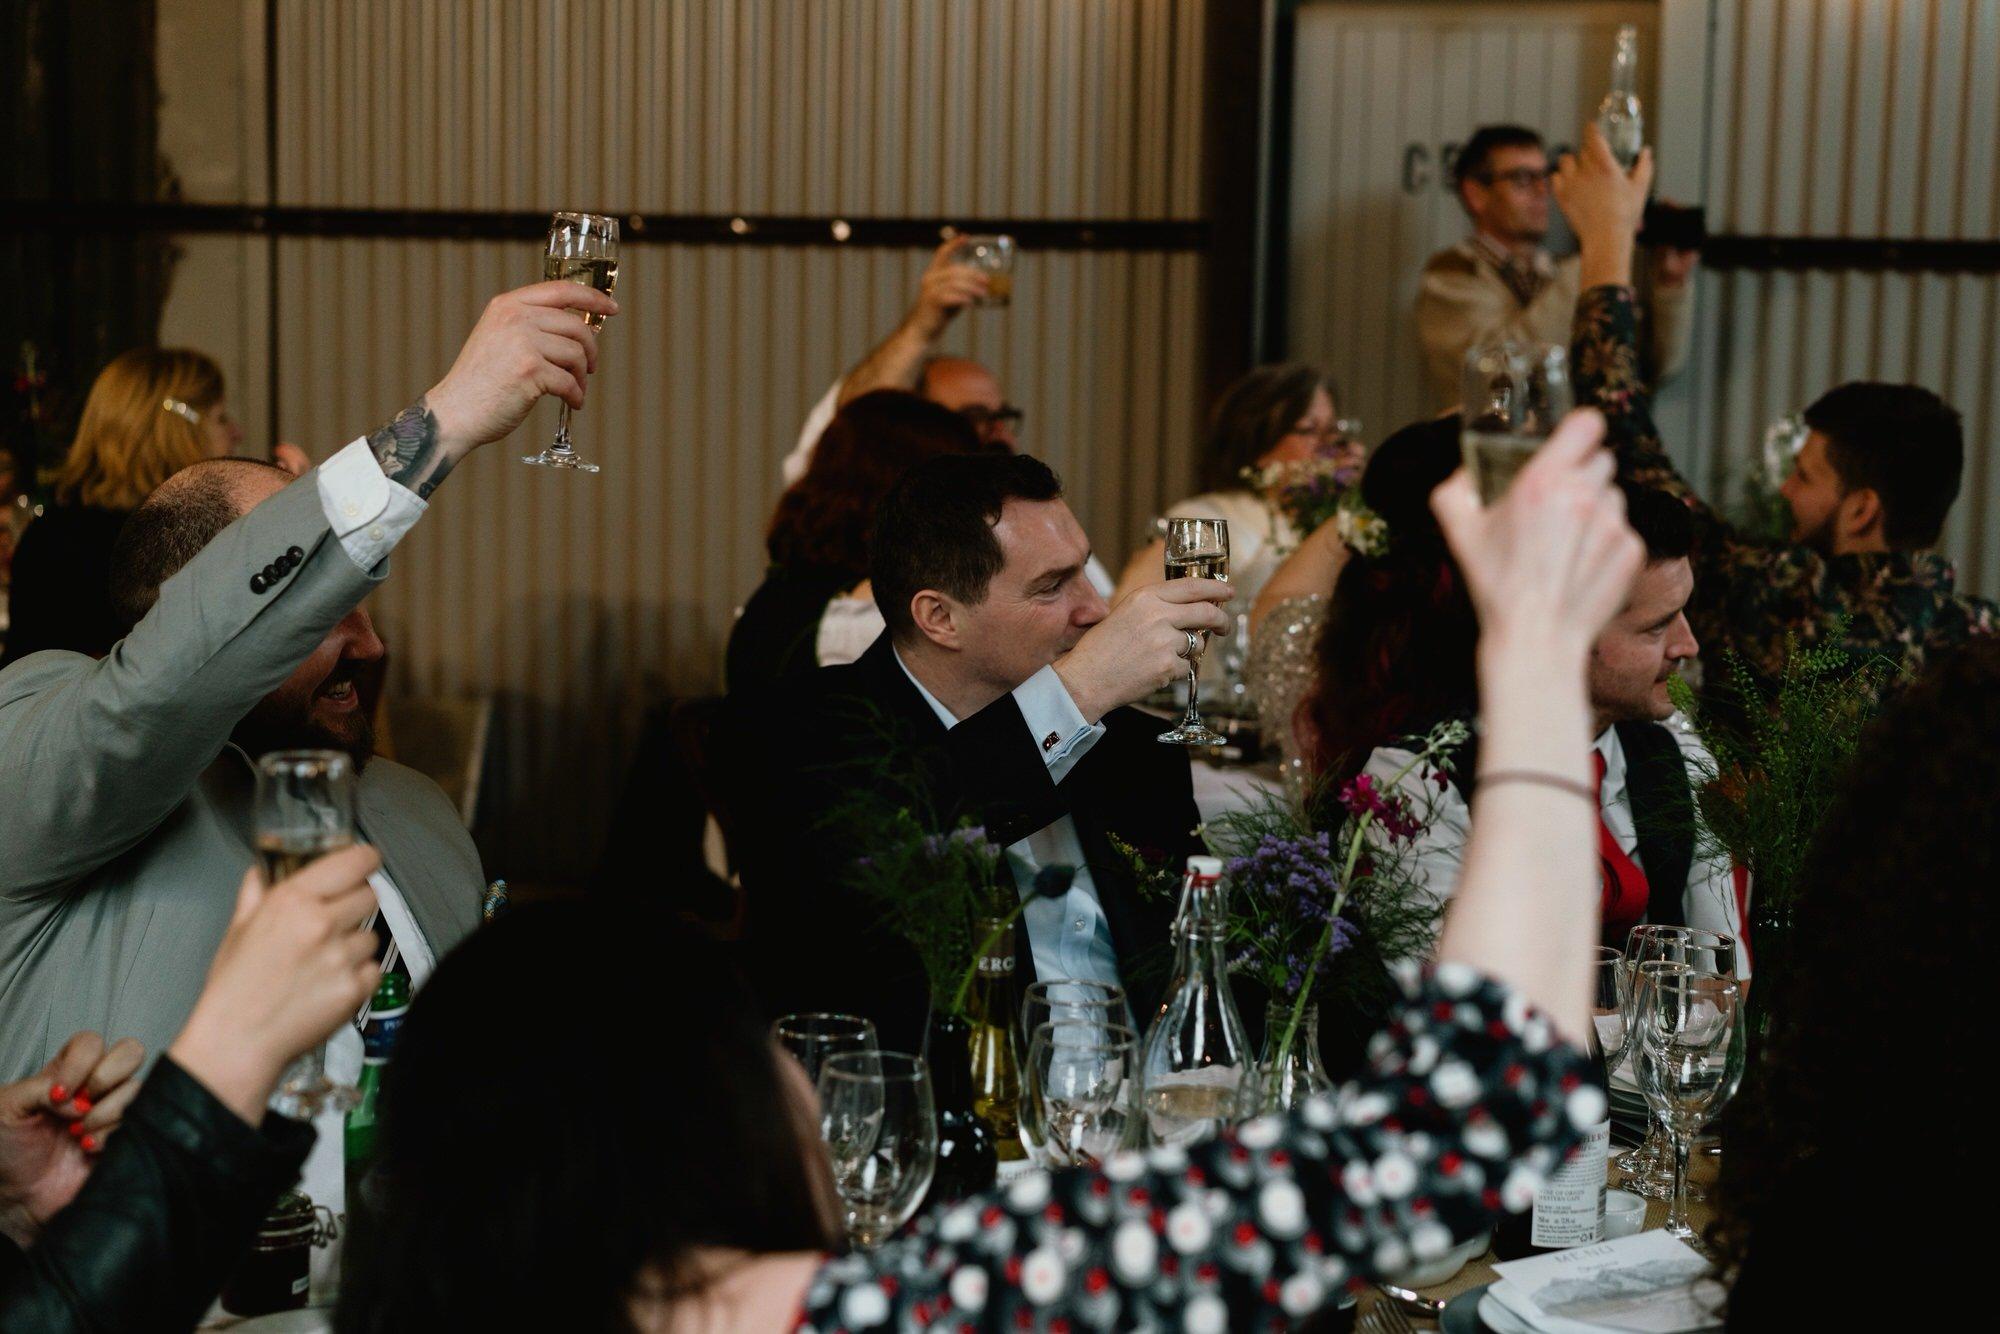 045 TIN SHED KNOCKRAICH WEDDING AUSTRIAN SCOTTISH ZOE ALEXANDRA PHOTOGRAPHY